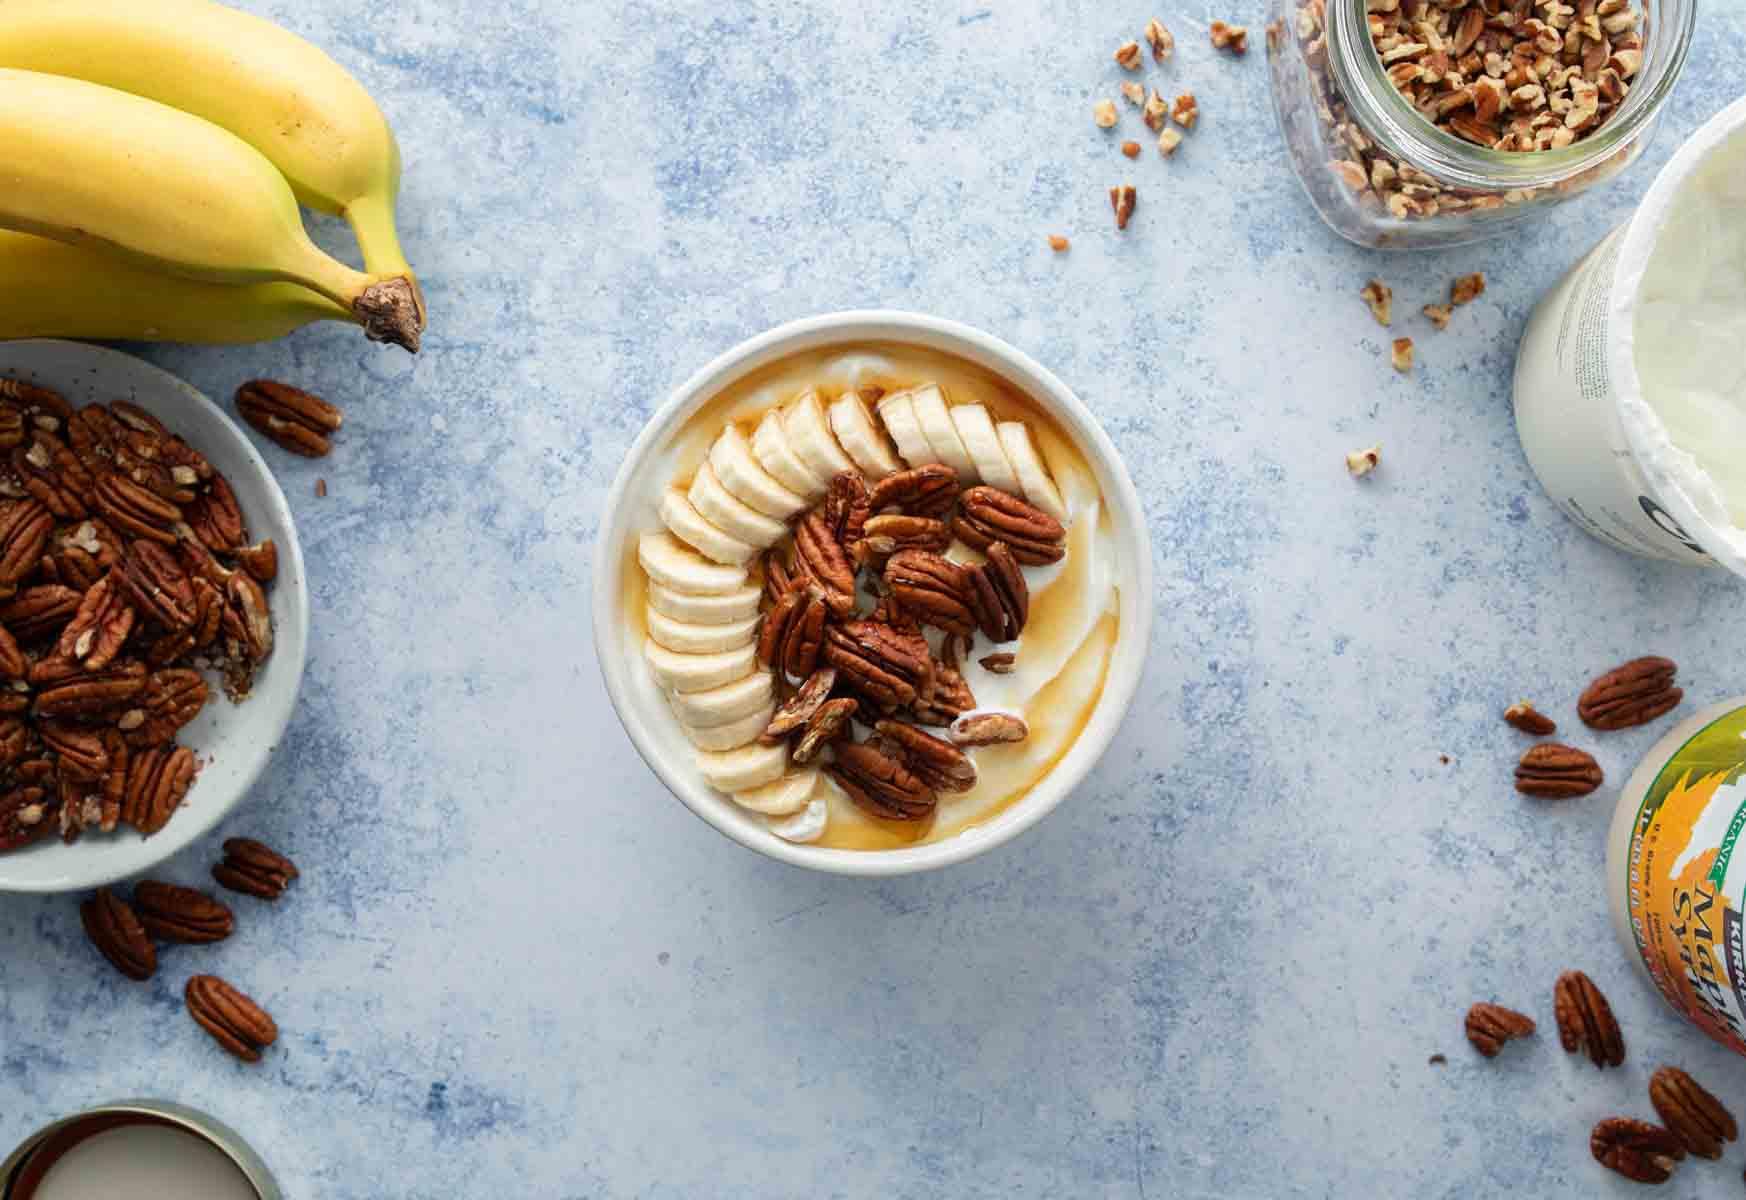 yogurt and strawberries for easy yogurt bowl recipe